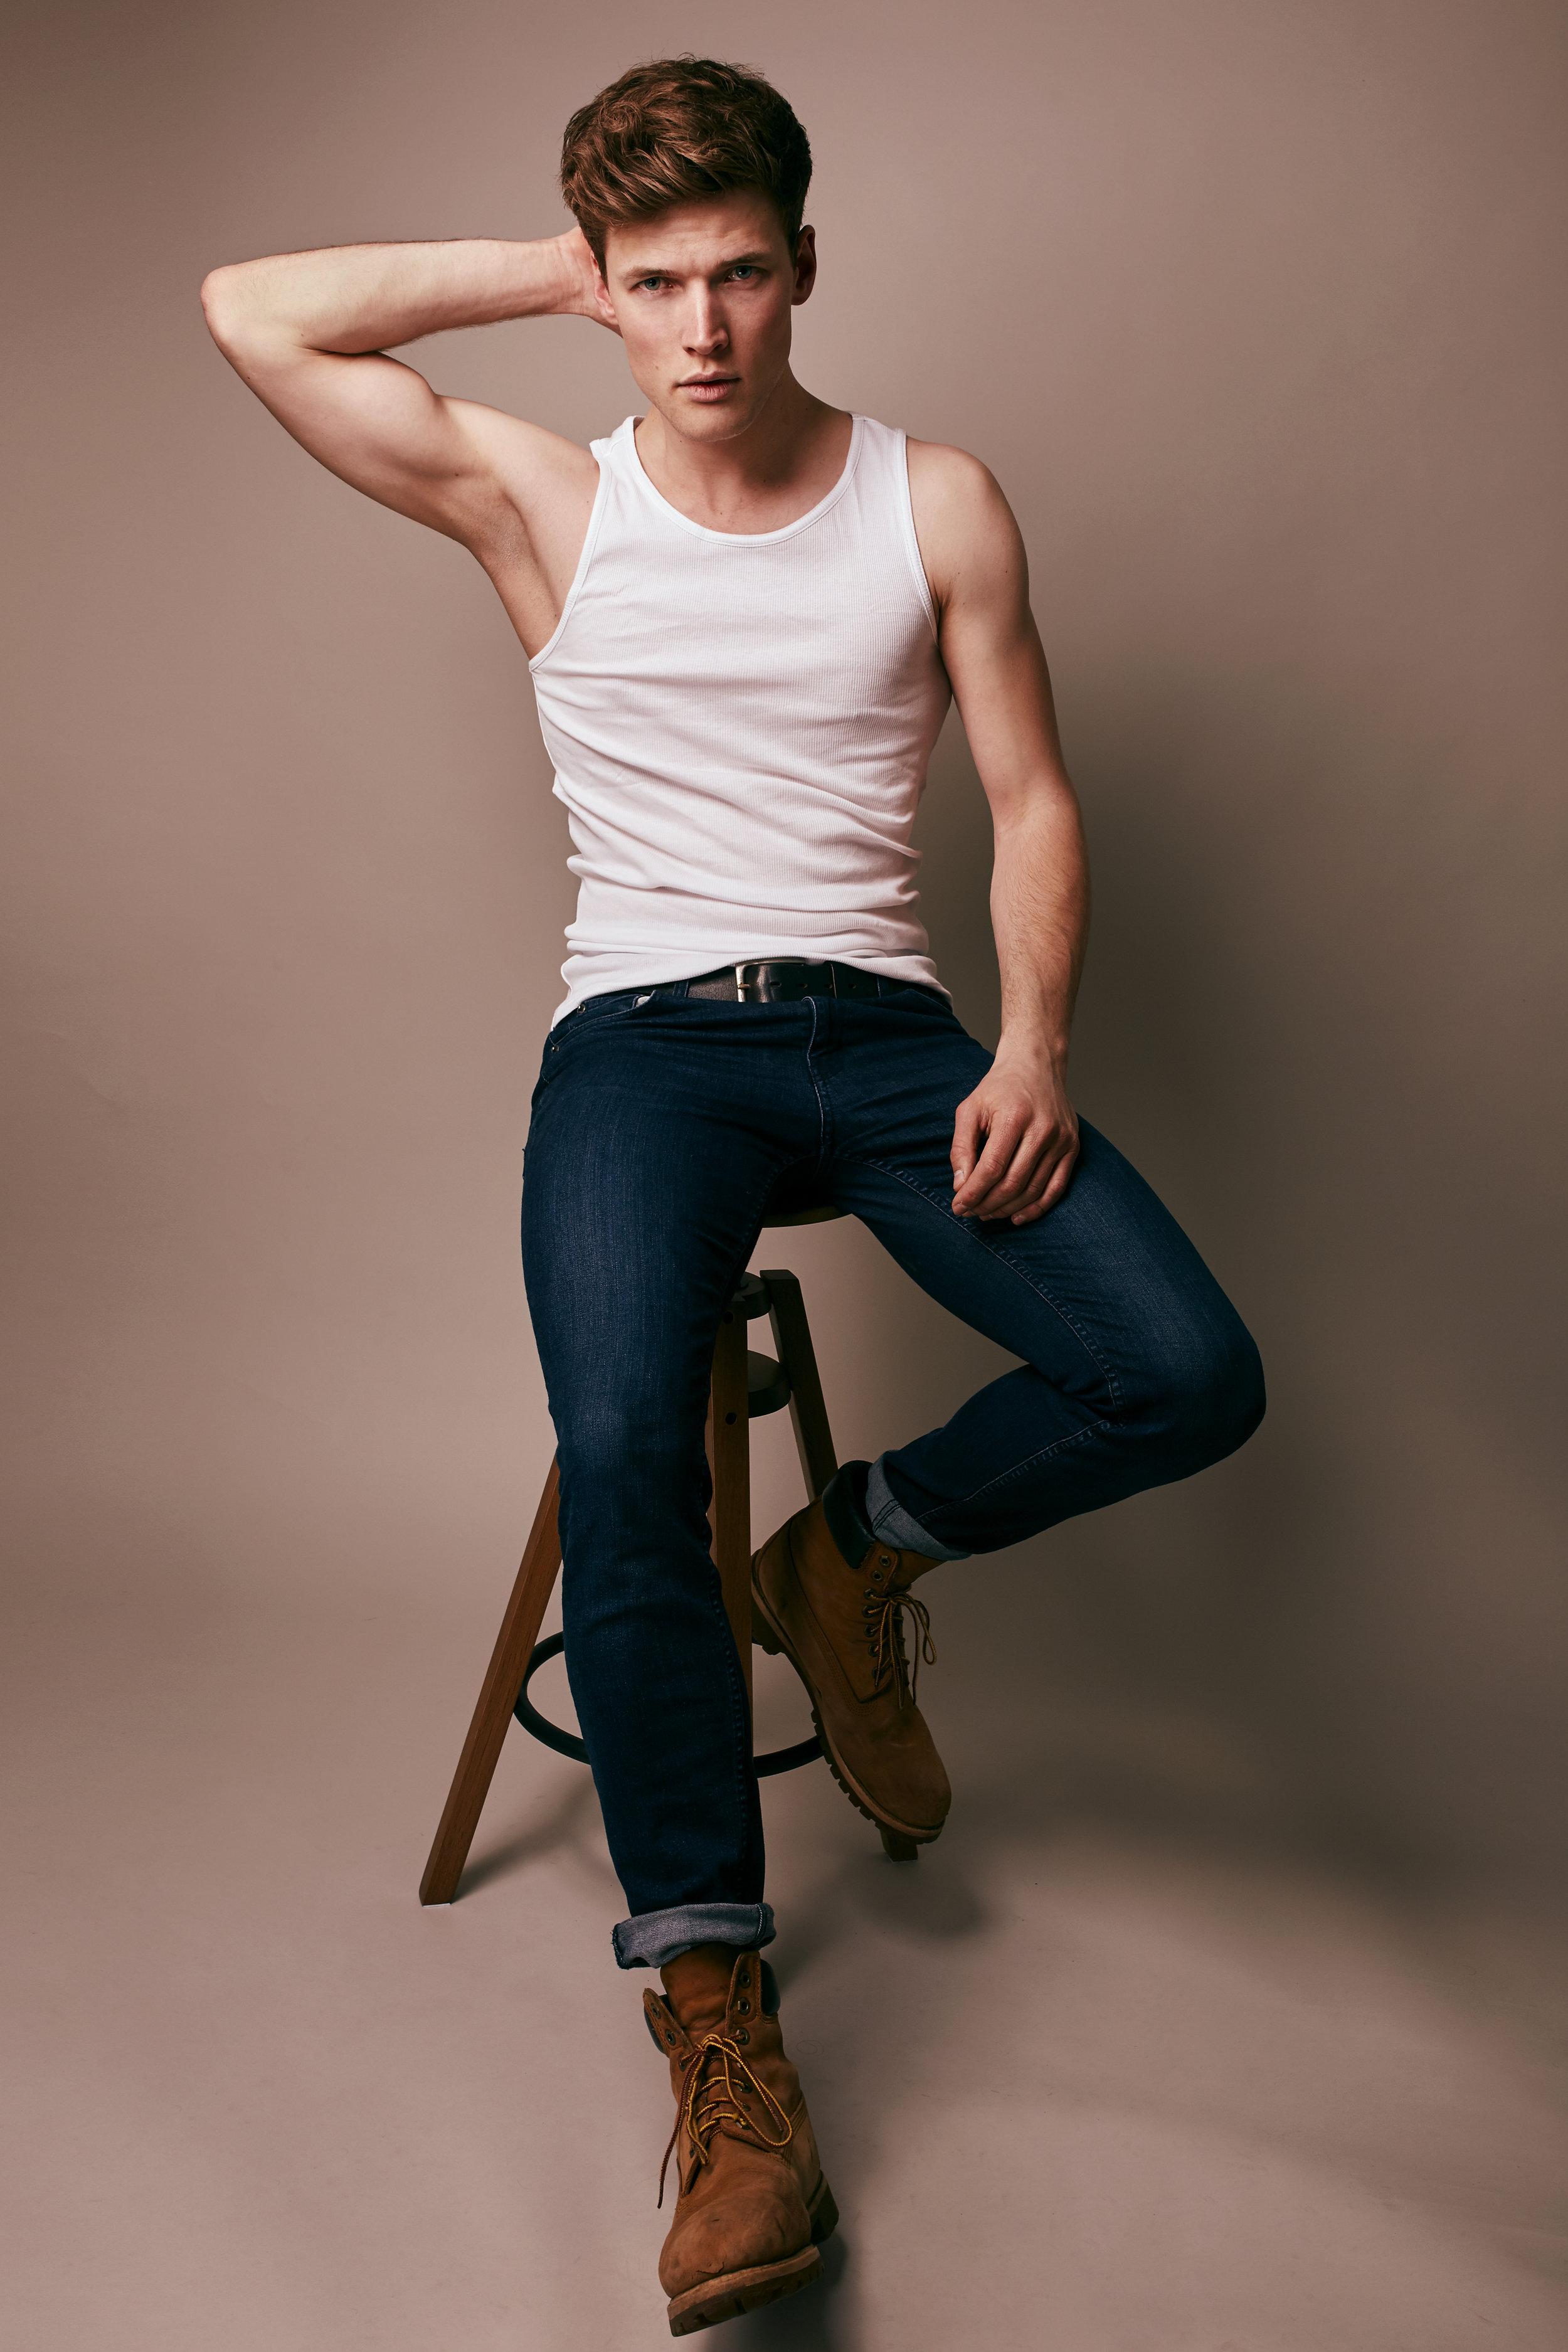 NC-Modelscouting-Stephan-M-03.jpg